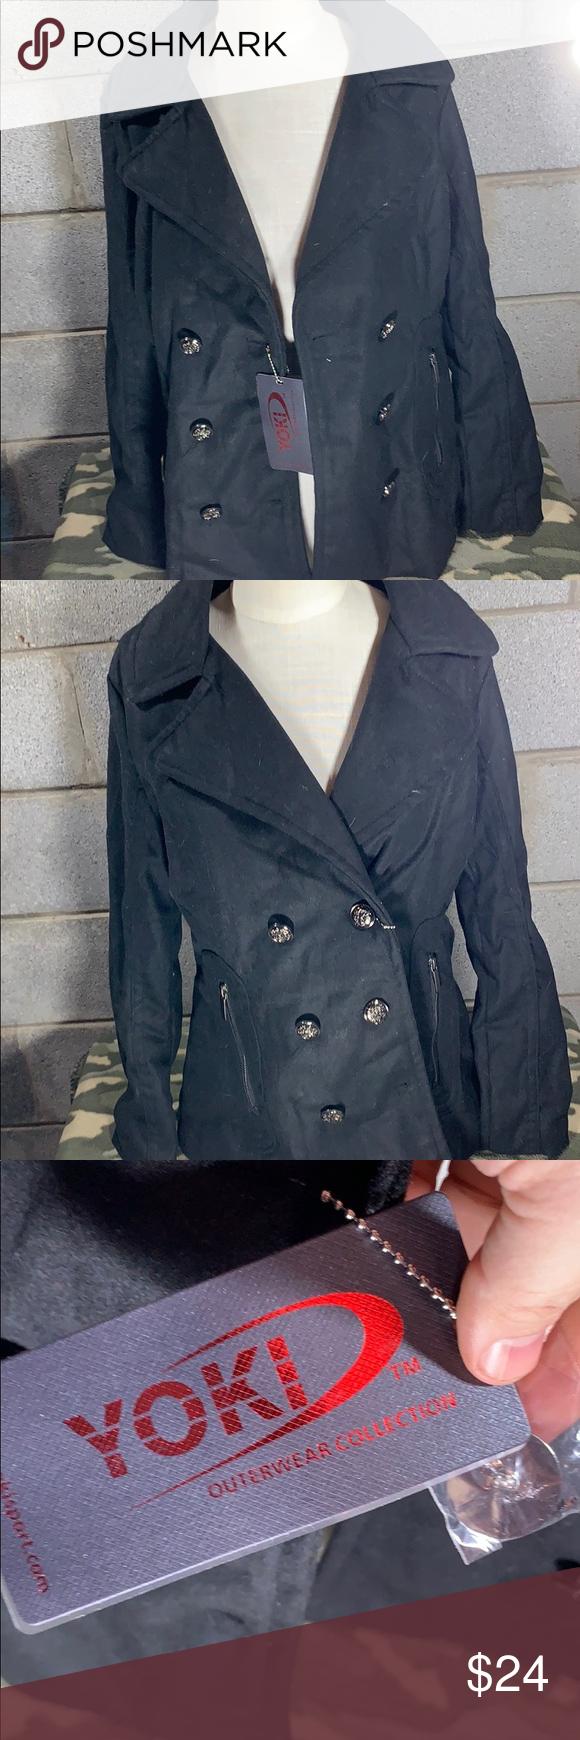 Yoki Women S Fleece Jacket Fleece Jacket Womens Fleece Jacket Jackets [ 1740 x 580 Pixel ]